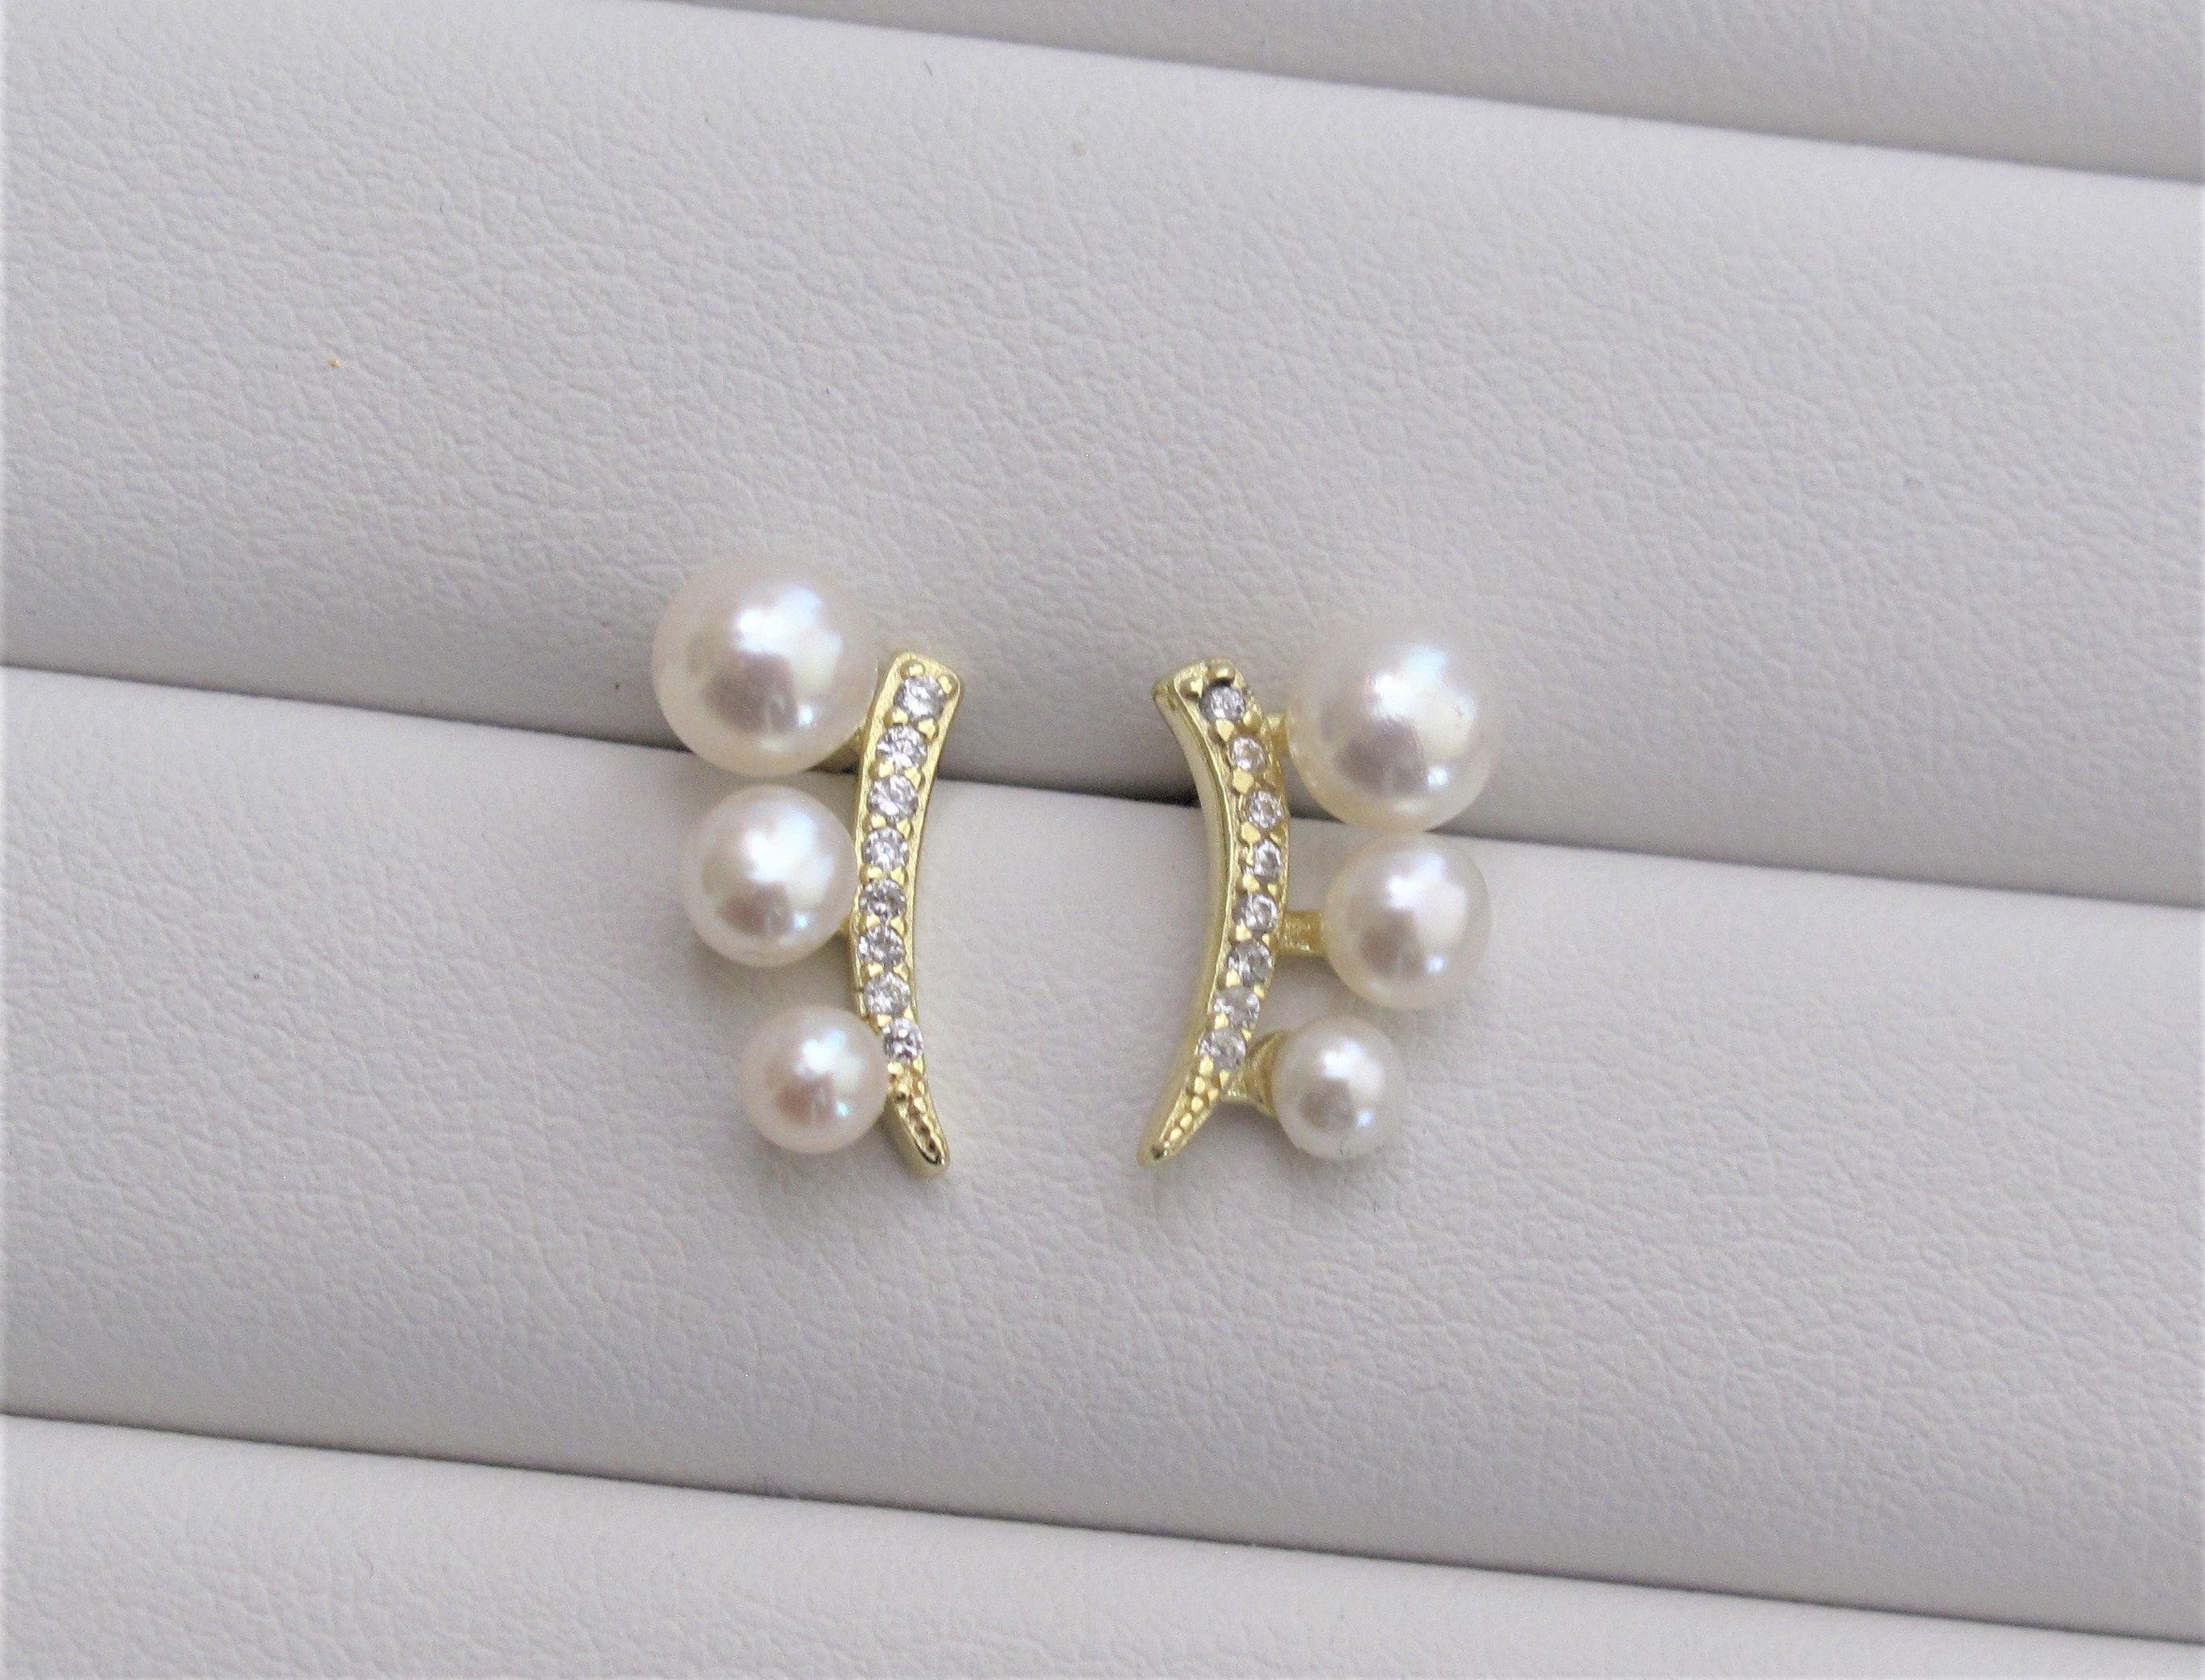 11-12mm white Baroque pearl earrings 18k ear stud Chic Cultured AAAA Flawless